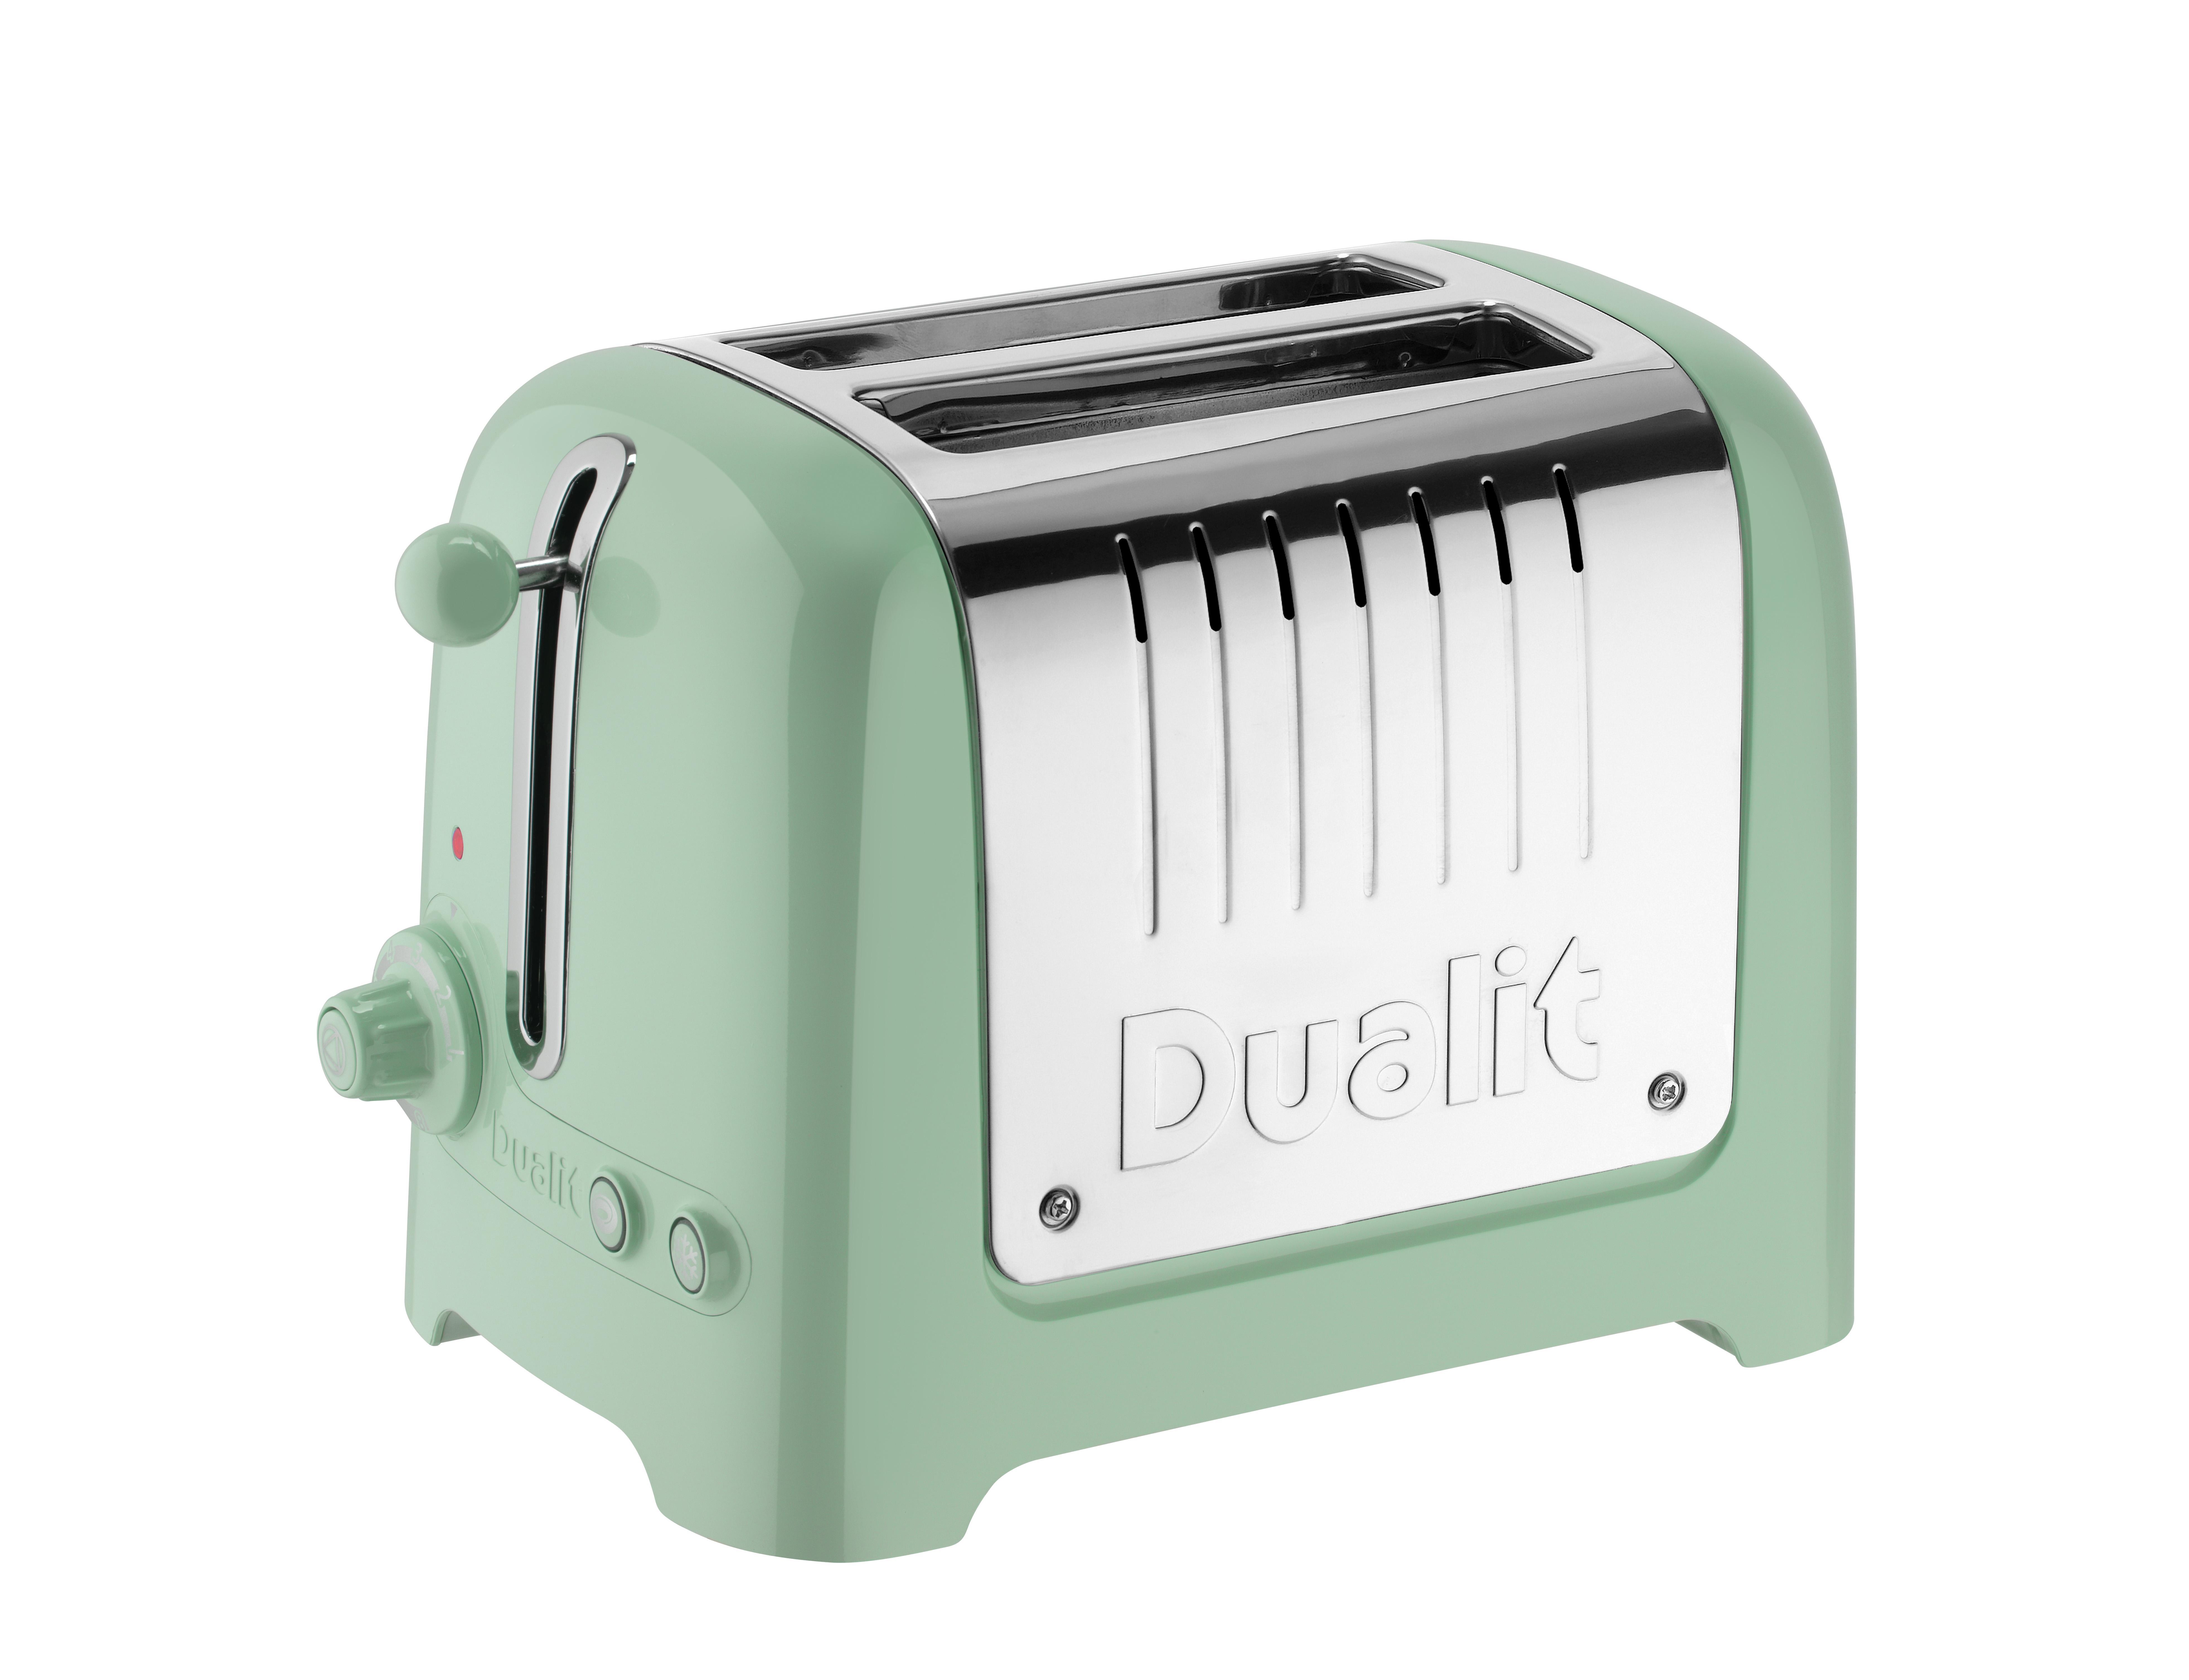 smart breville oven black model in pro pin toaster kitchen